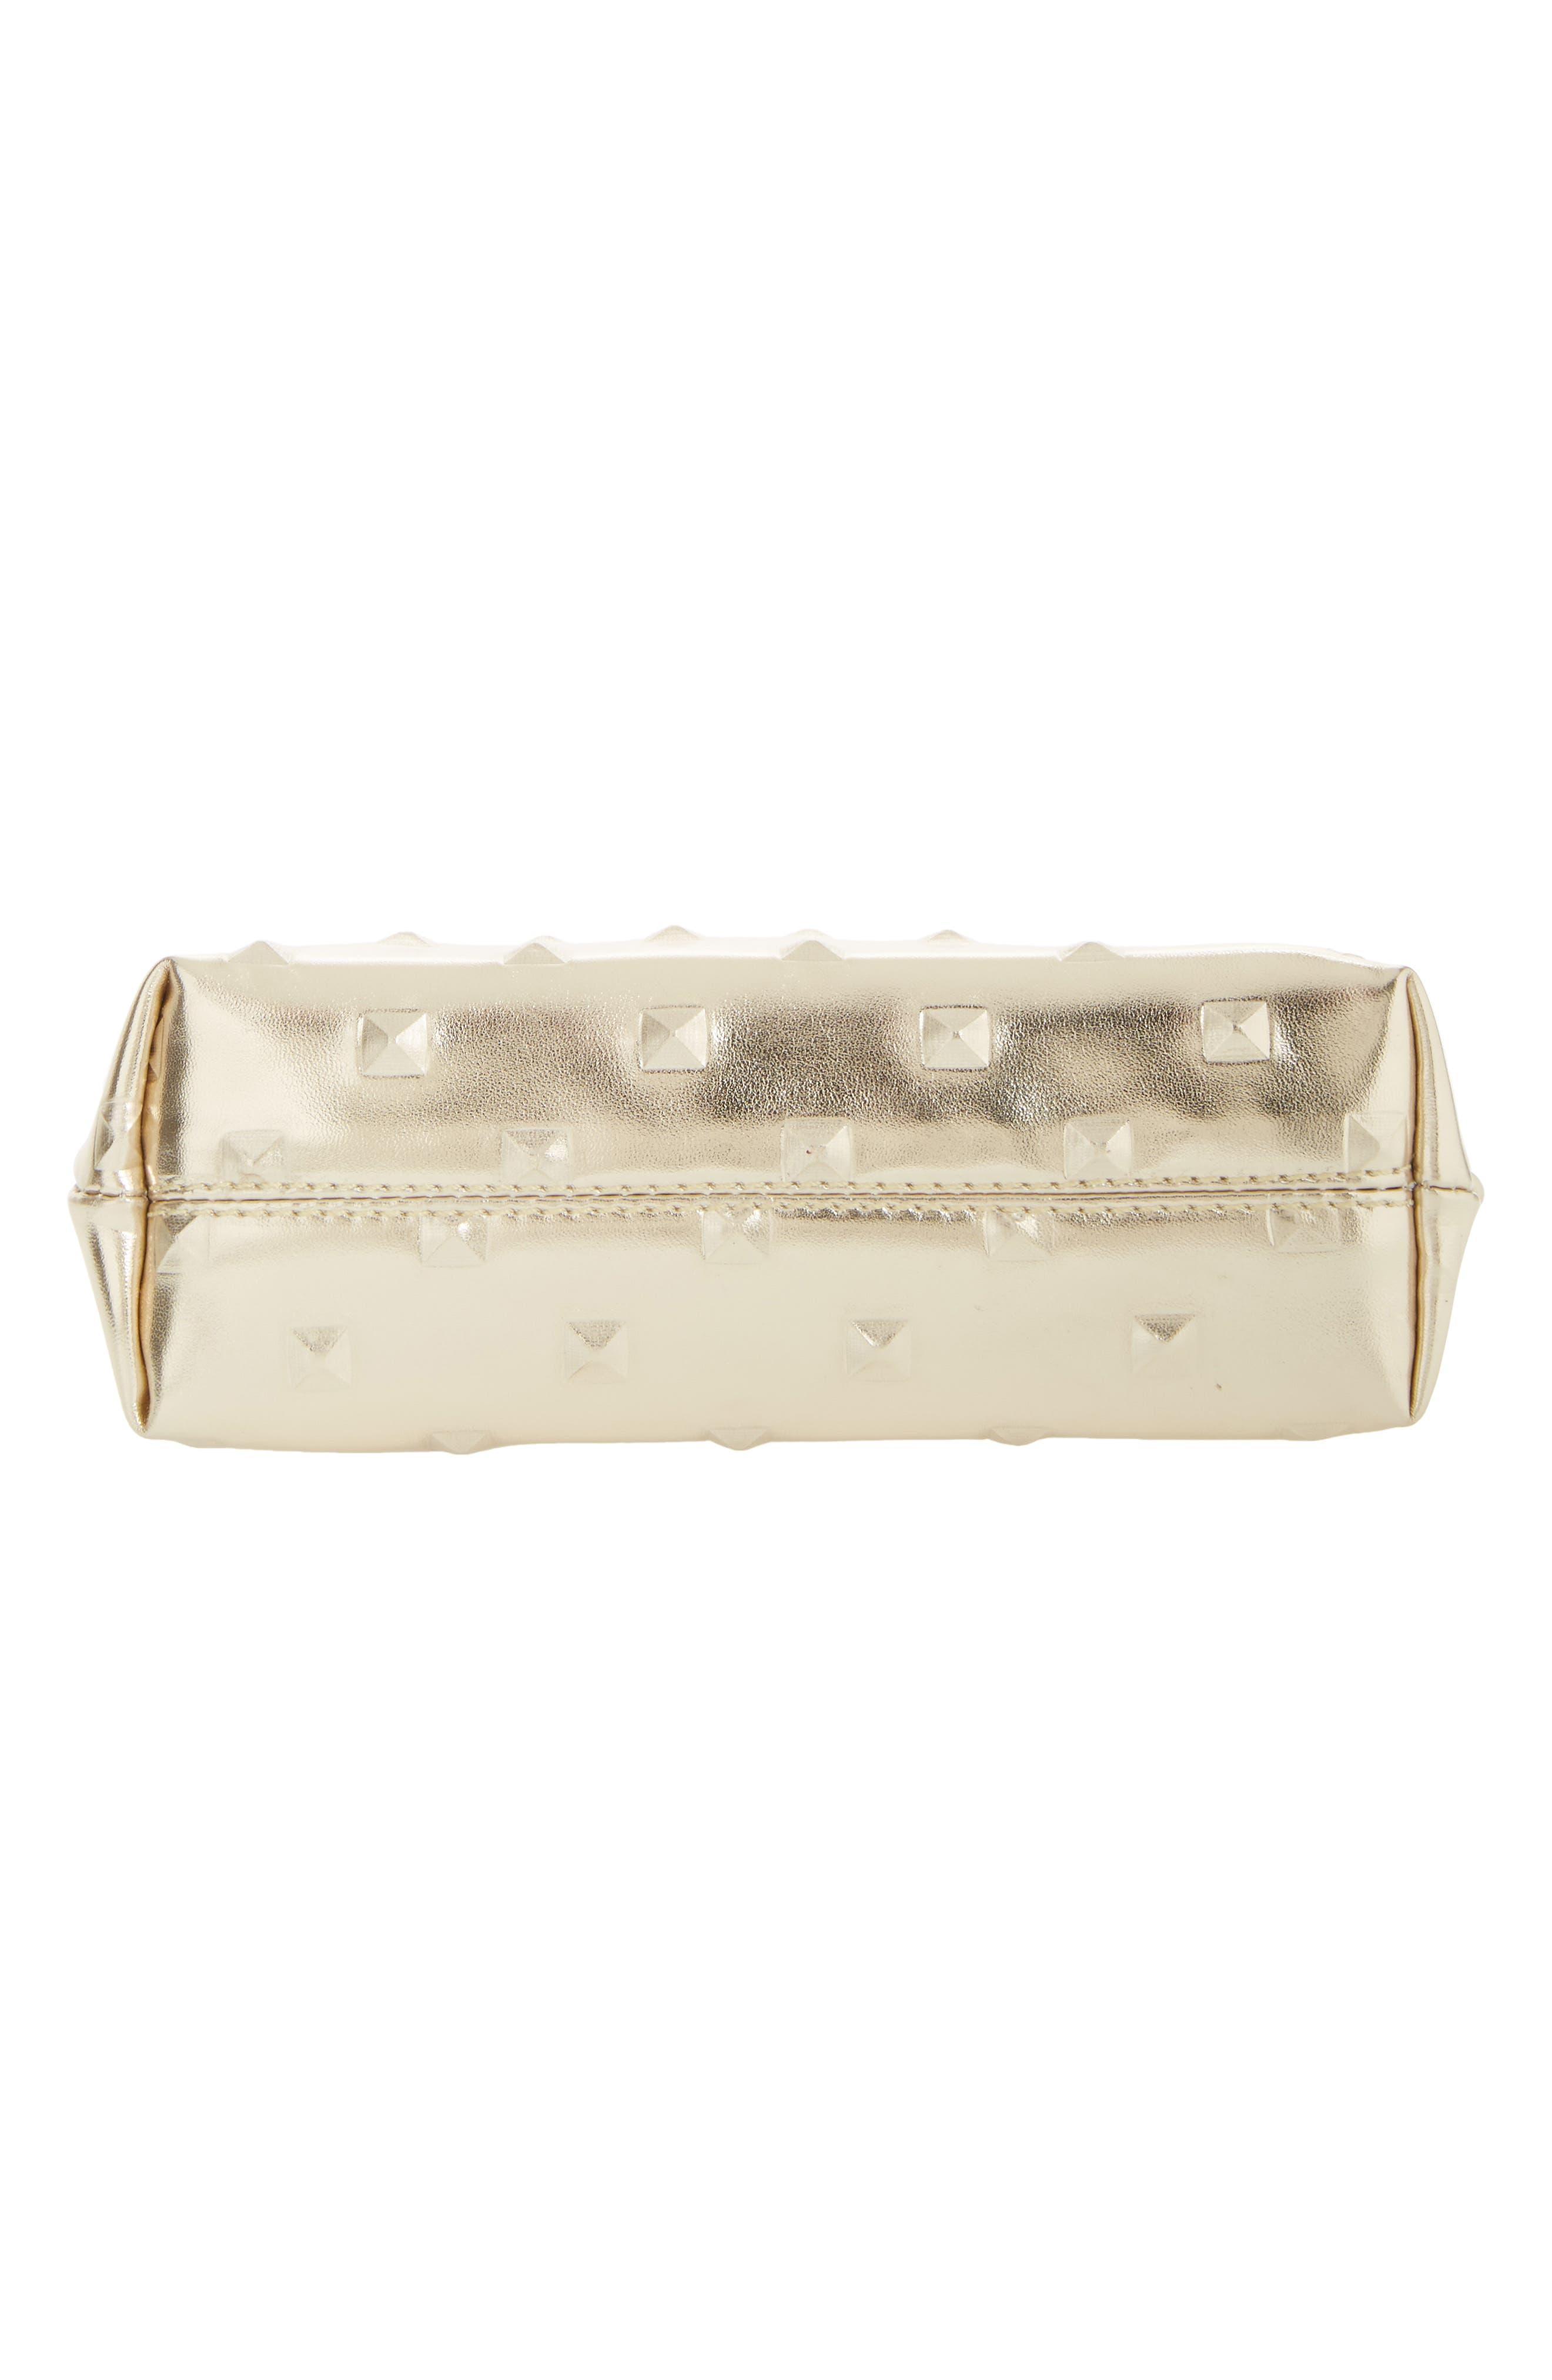 Diamond Embossed Metallic Cosmetics Bag,                             Alternate thumbnail 5, color,                             Gold